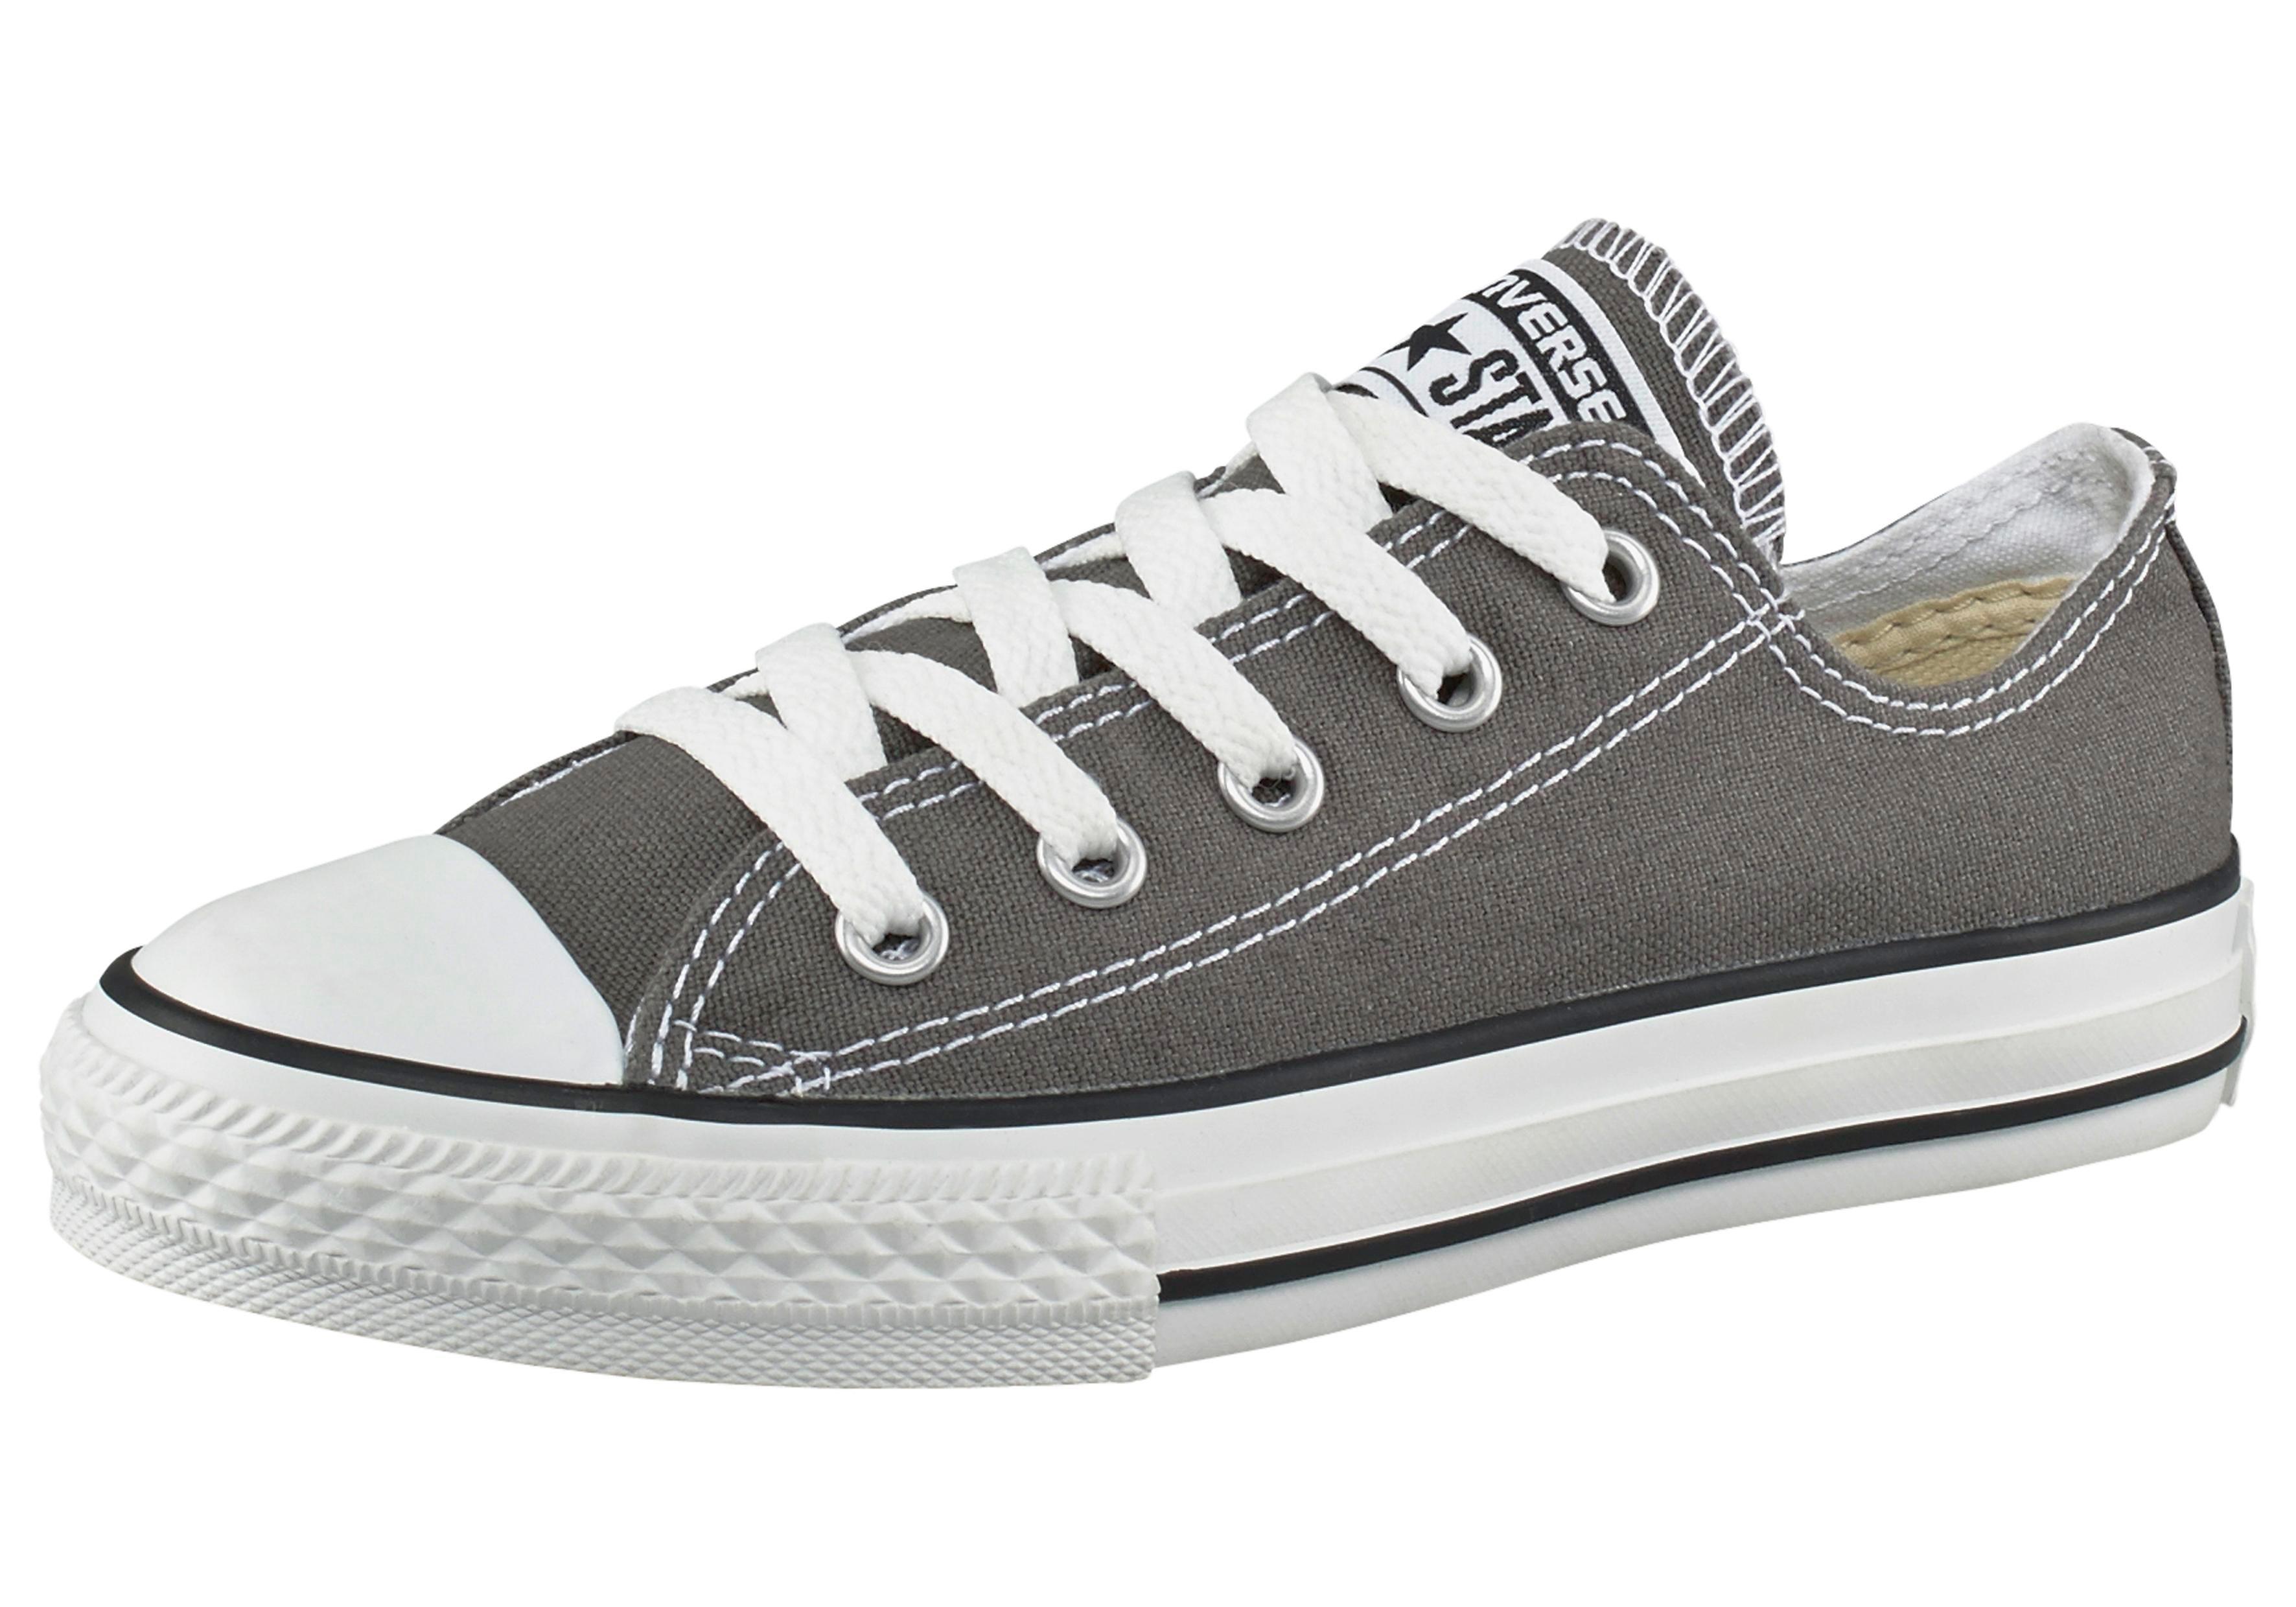 52334e01dbc ... Converse sneakers »Chuck Taylor Basic Leather Ox«, CONVERSE Sneakers Chuck  Taylor All Star Core Ox, CONVERSE Sneakers Chuck Taylor All Star Core Hi,  ...